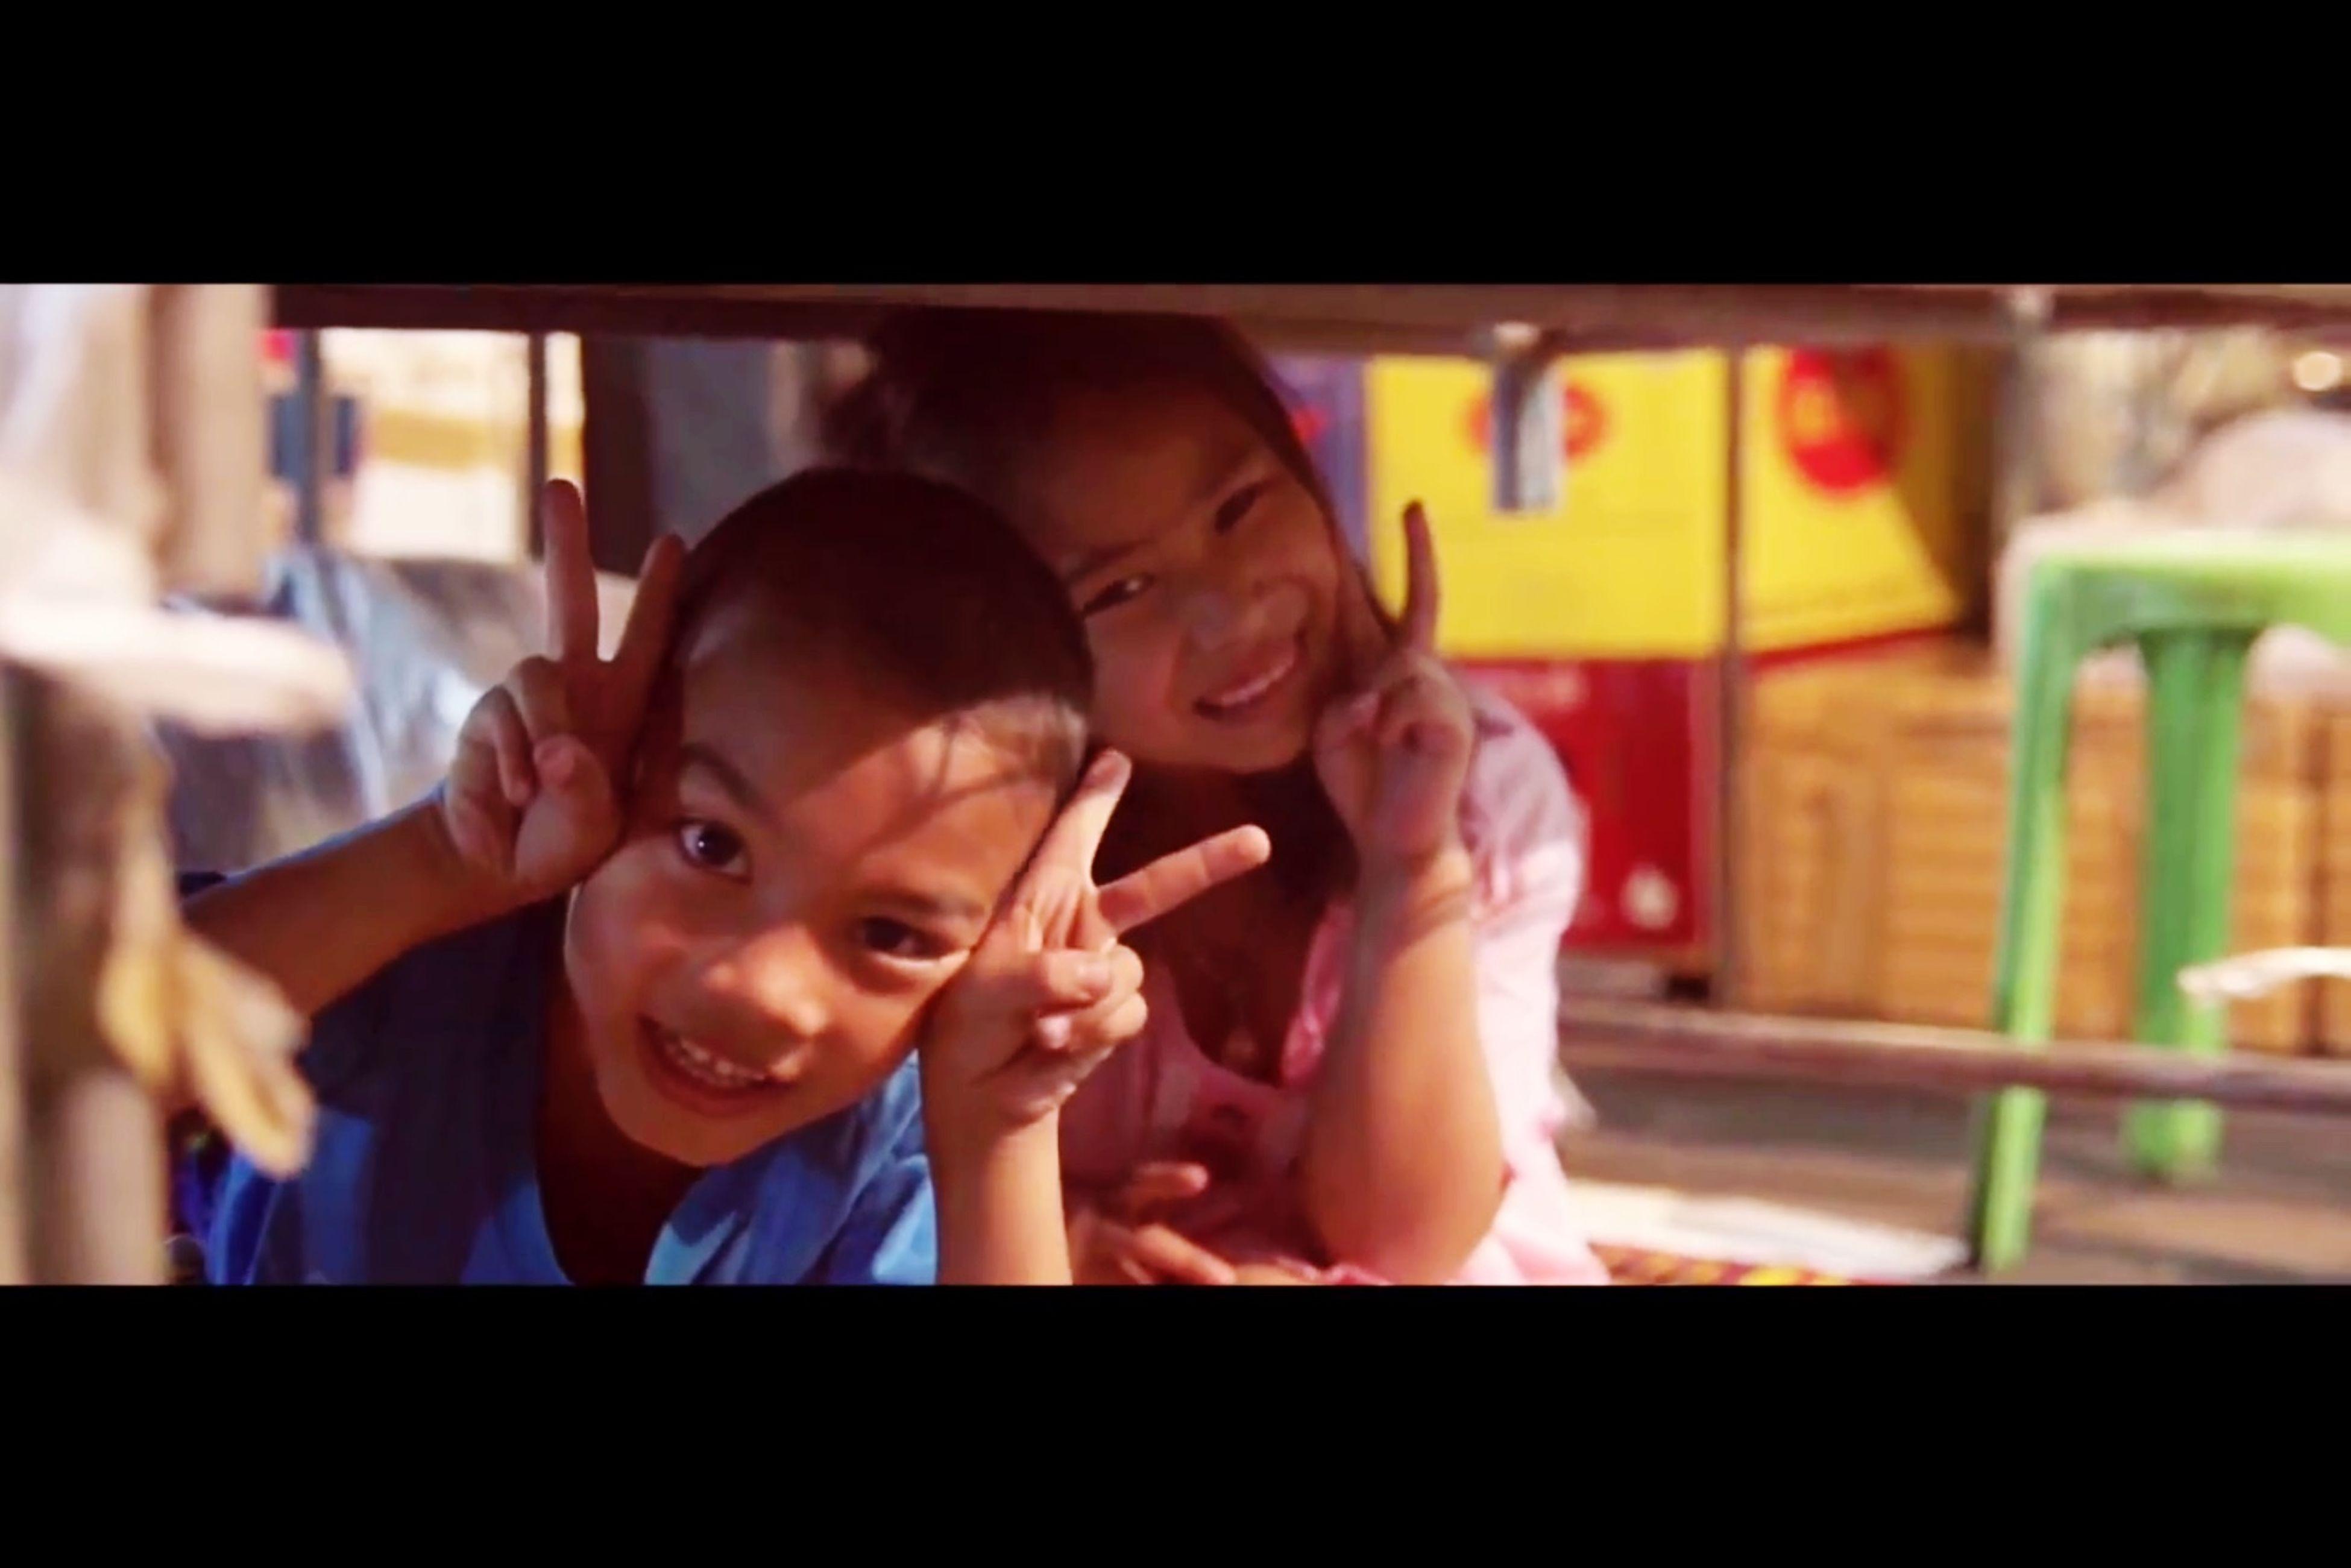 EyeEmBestPics Bangkok Nightlife Smile Capture Music Video Artist Cr.อพาร์ตเมนต์คุณป้า รักในมหานคร